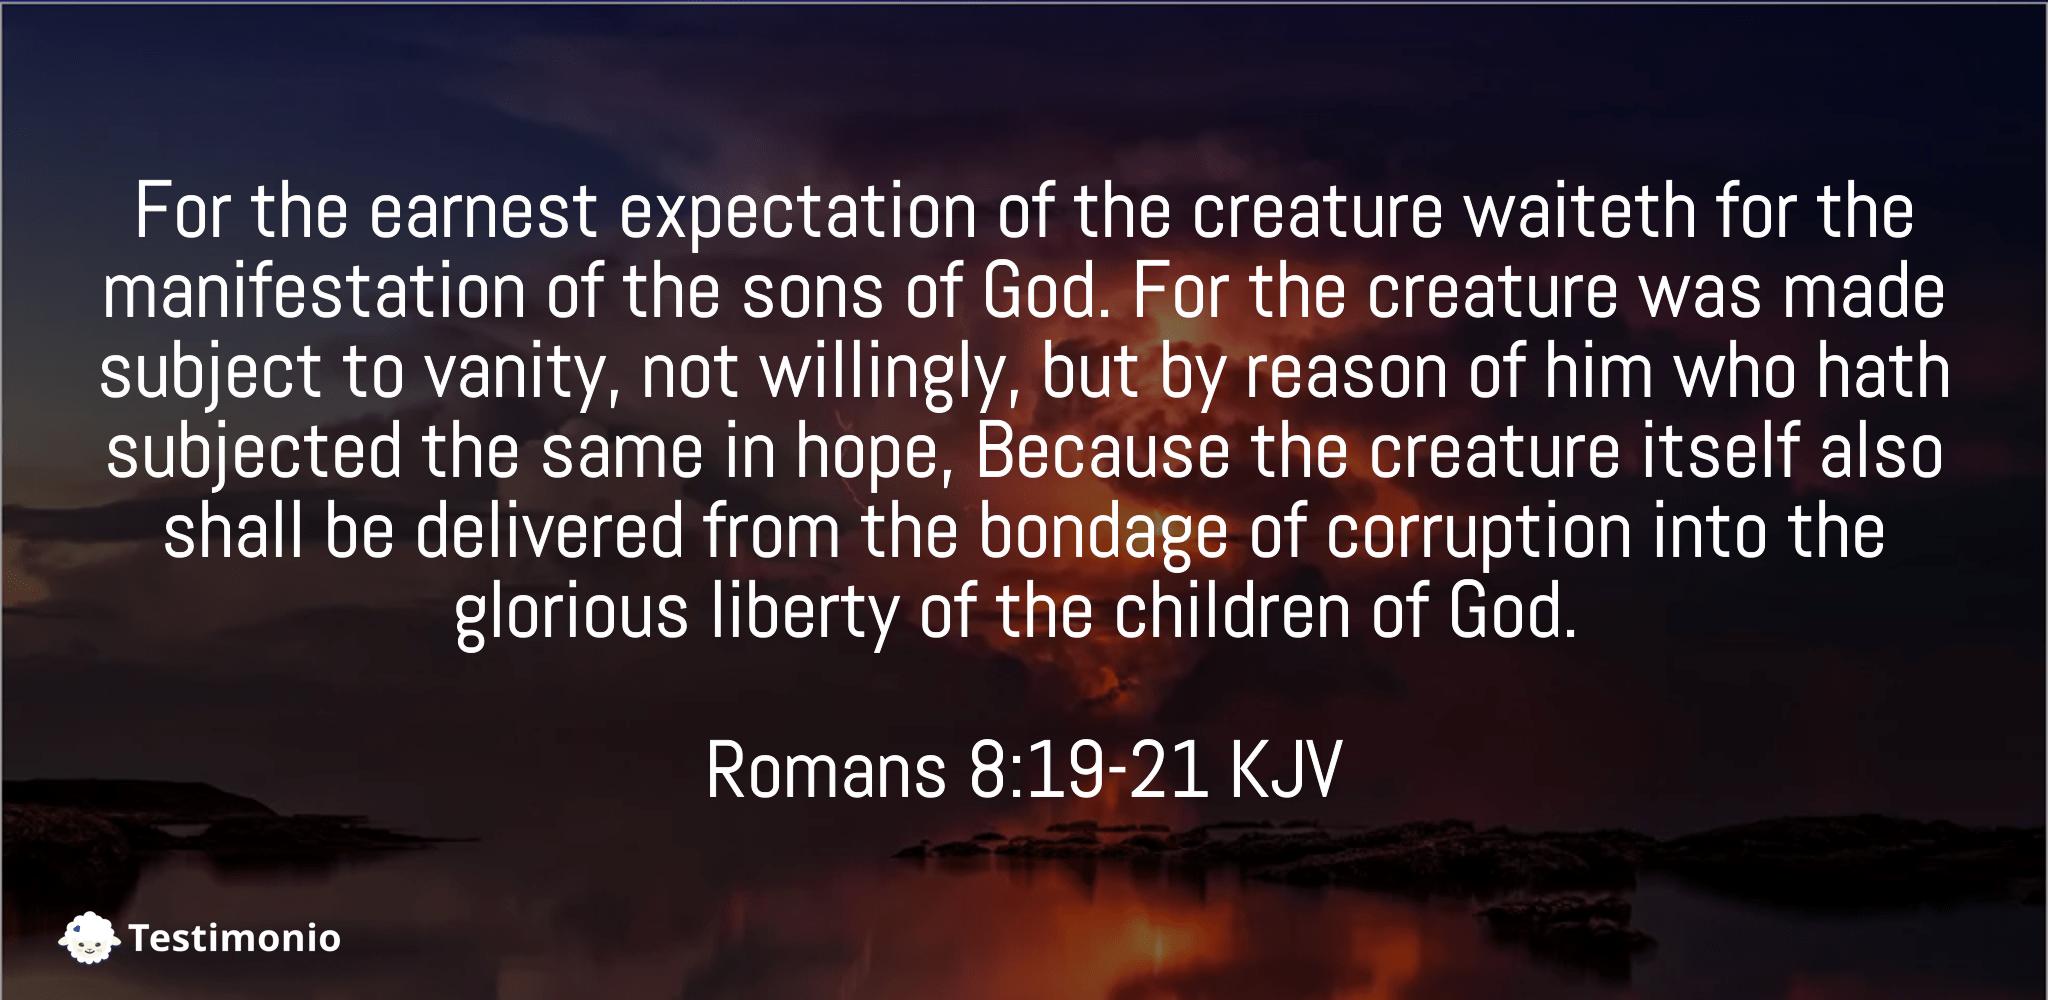 Romans 8:19-21